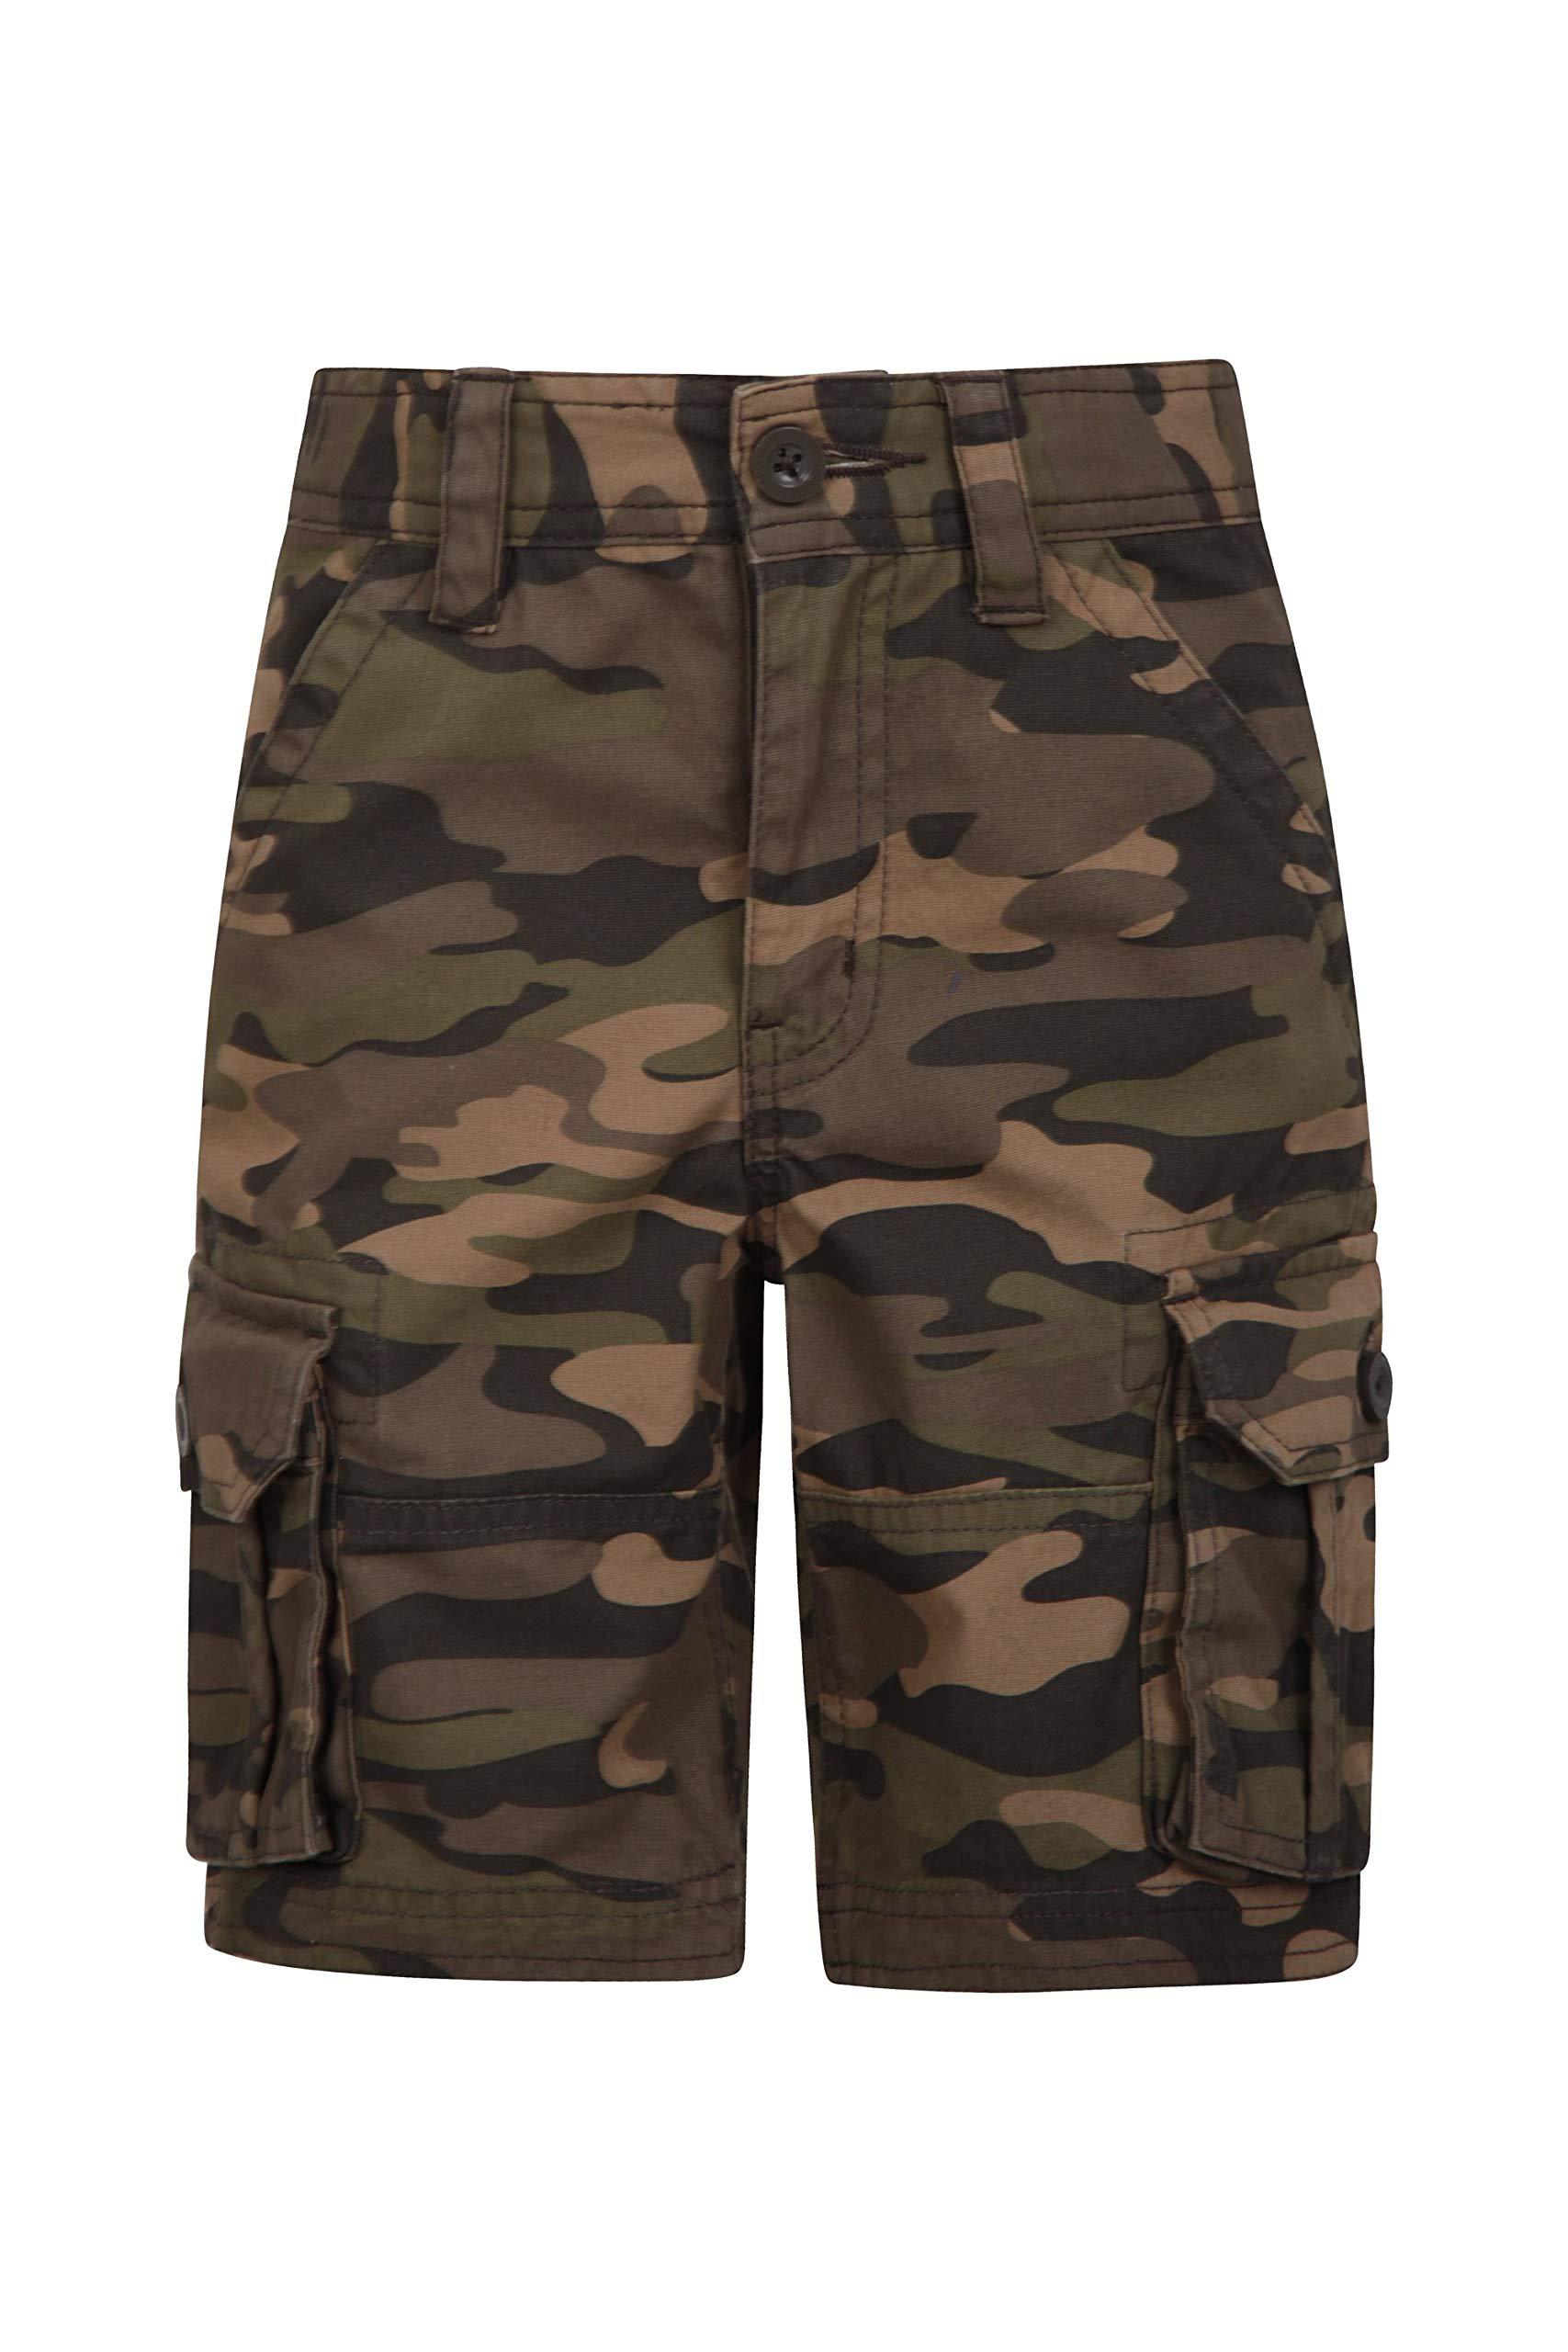 Mountain Warehouse Kids Camo Cargo Shorts - 100% Cotton Summer Pants Khaki 11-12 Years by Mountain Warehouse